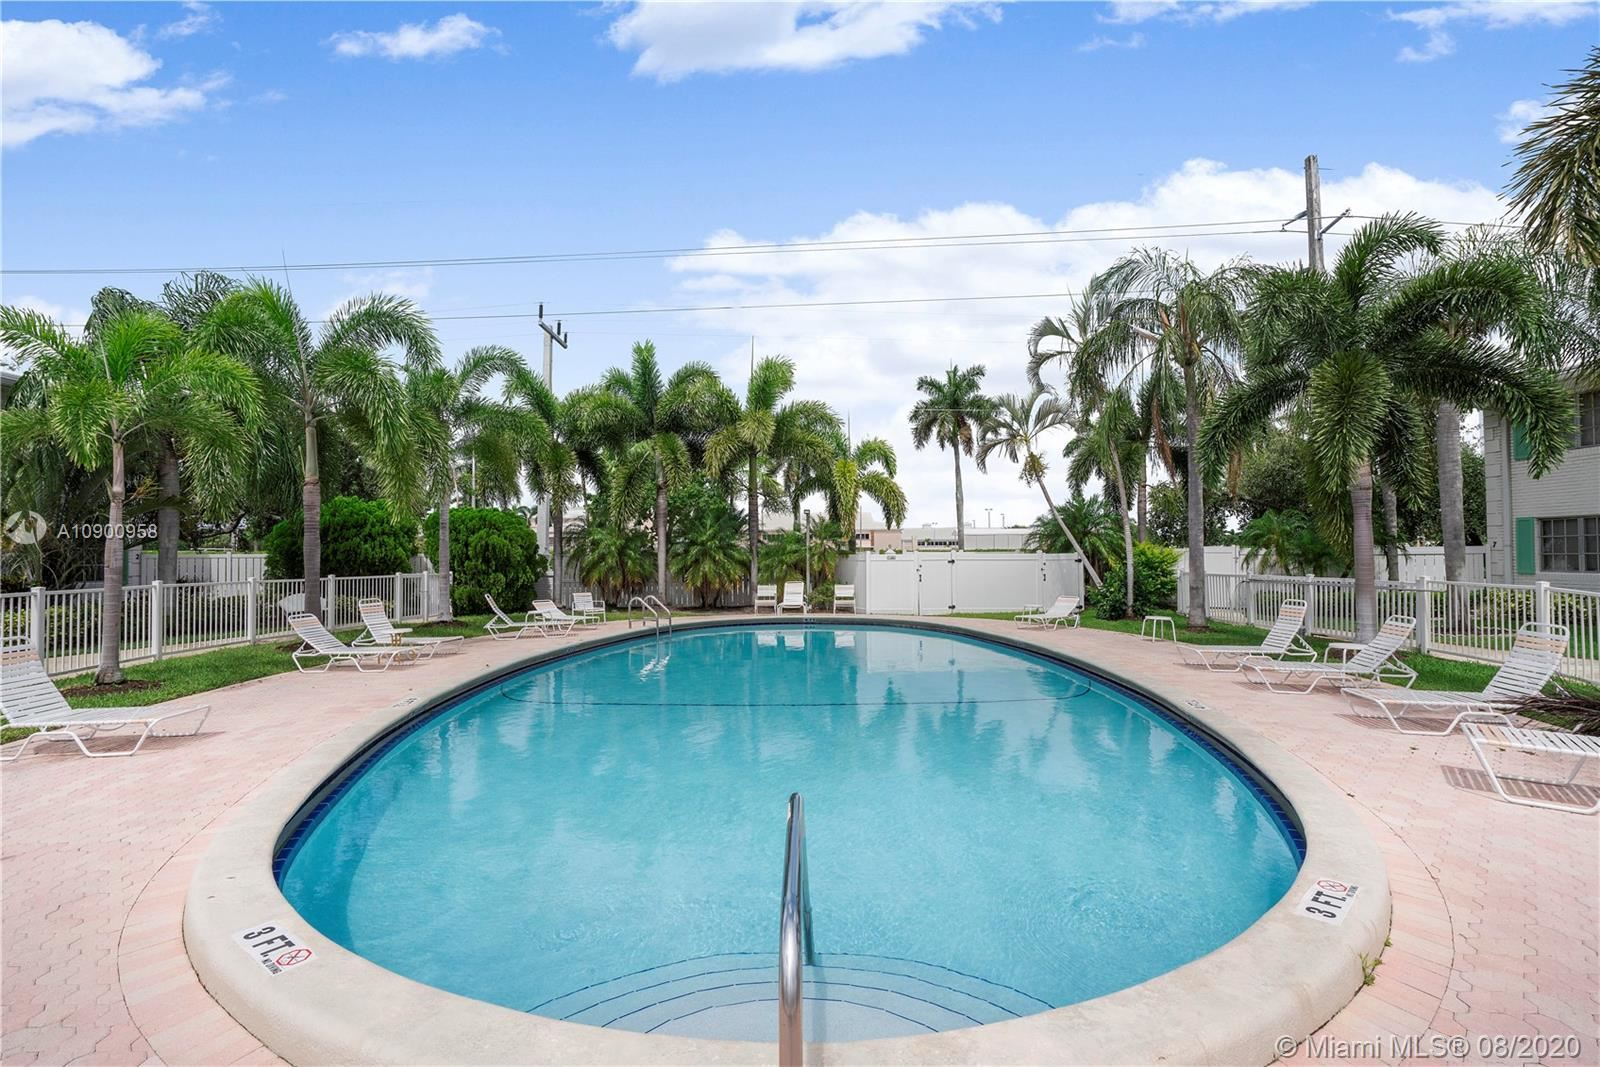 1801 NE 62nd St #106, Fort Lauderdale, FL 33308 - #: A10900958